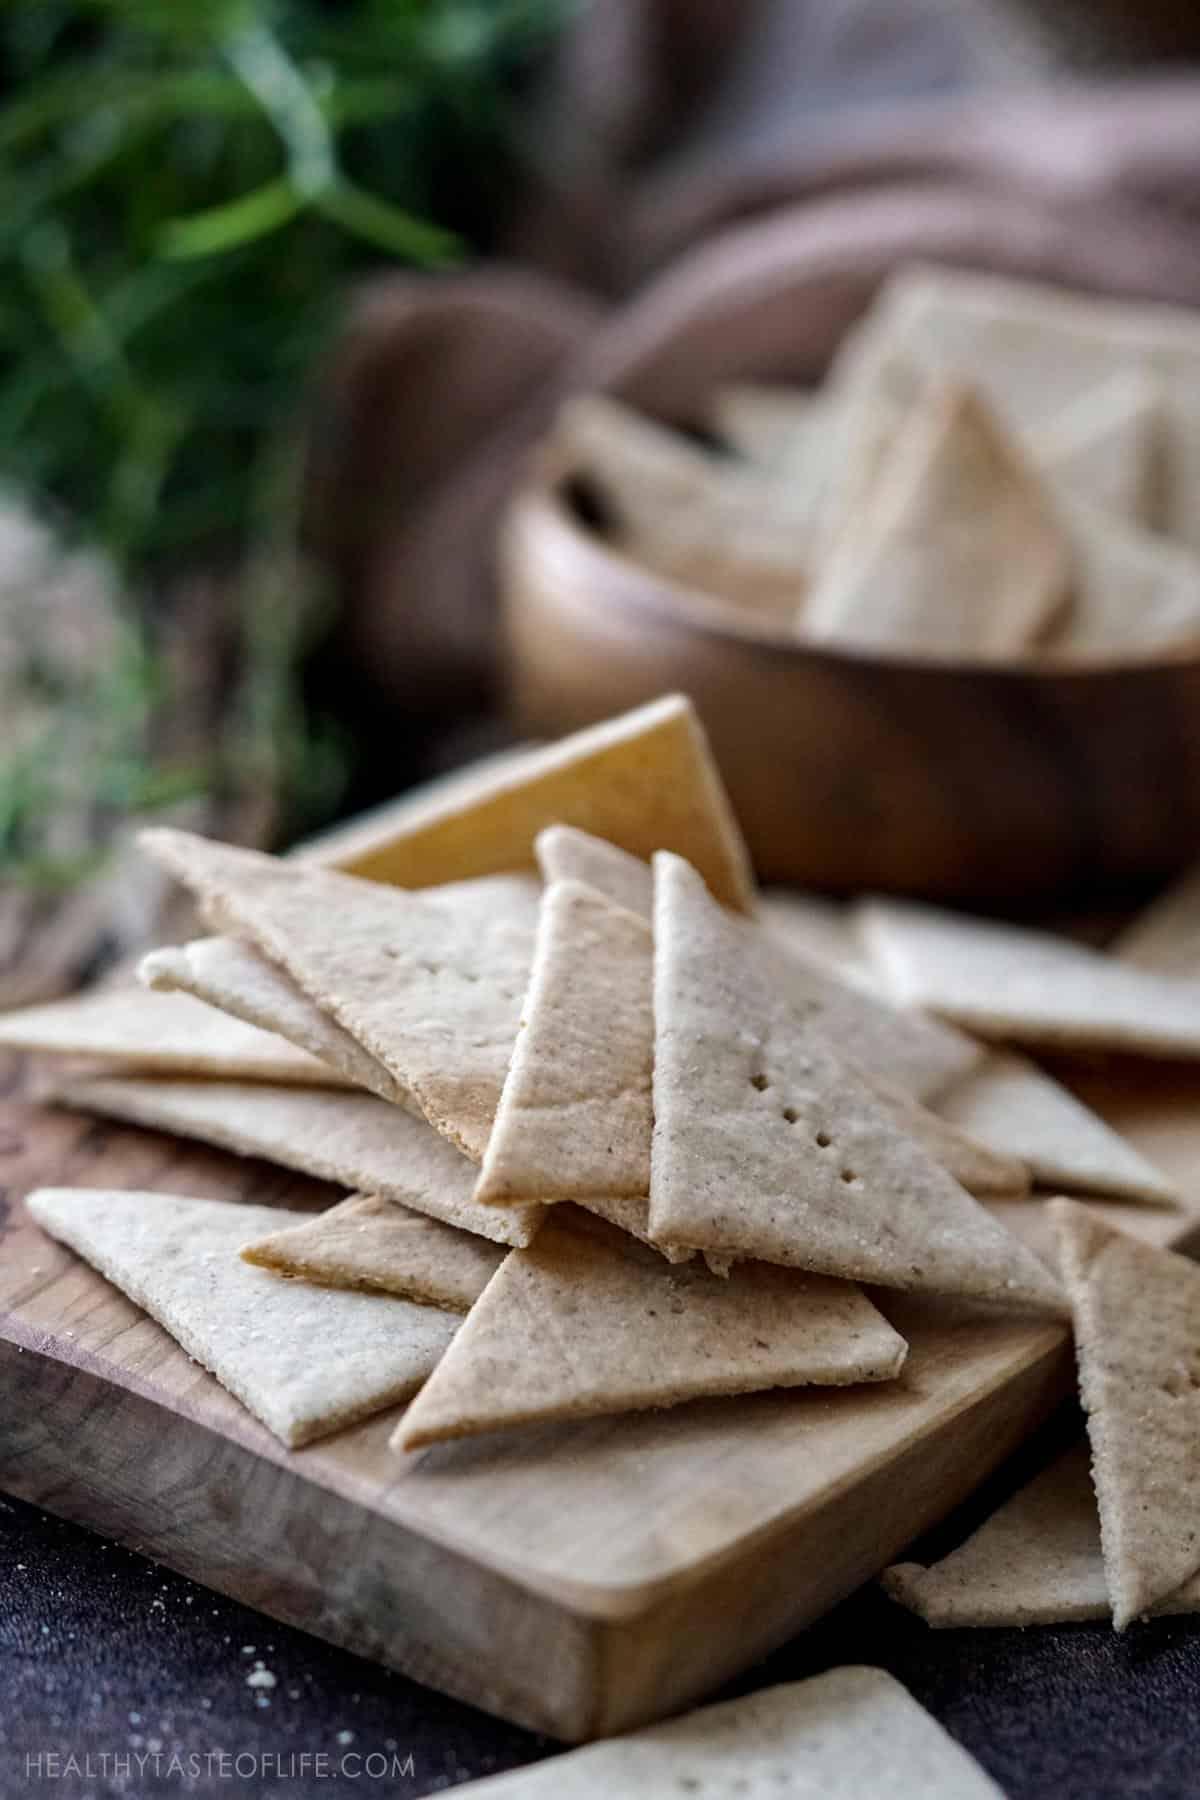 Cassava Crackers grain free and vegan crackers made with tigernut flour, cassava flour and ground flax seeds.